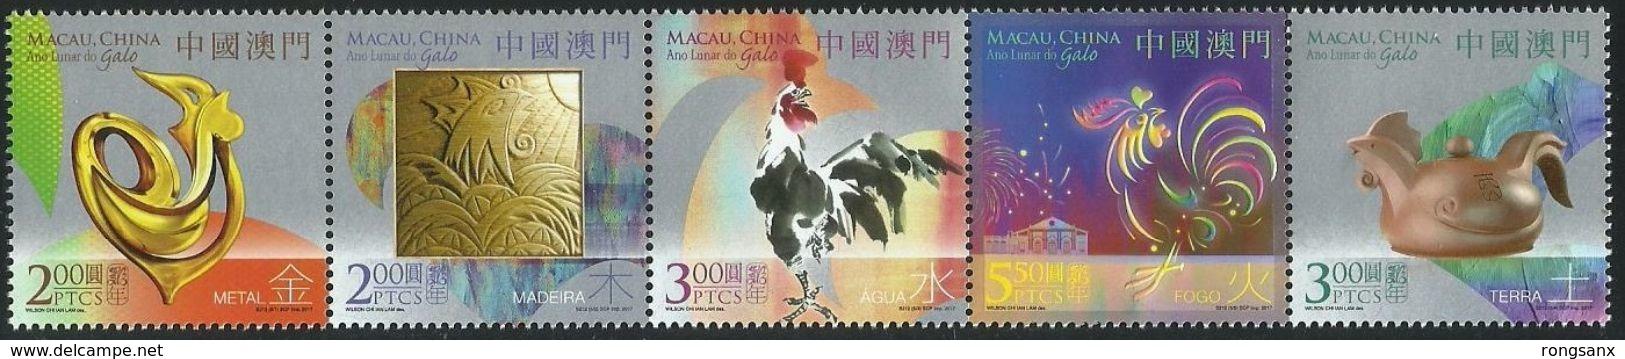 2017 MACAO/MACAU YEAR OF THE Cock STAMP 5V - 1999-... Chinese Admnistrative Region